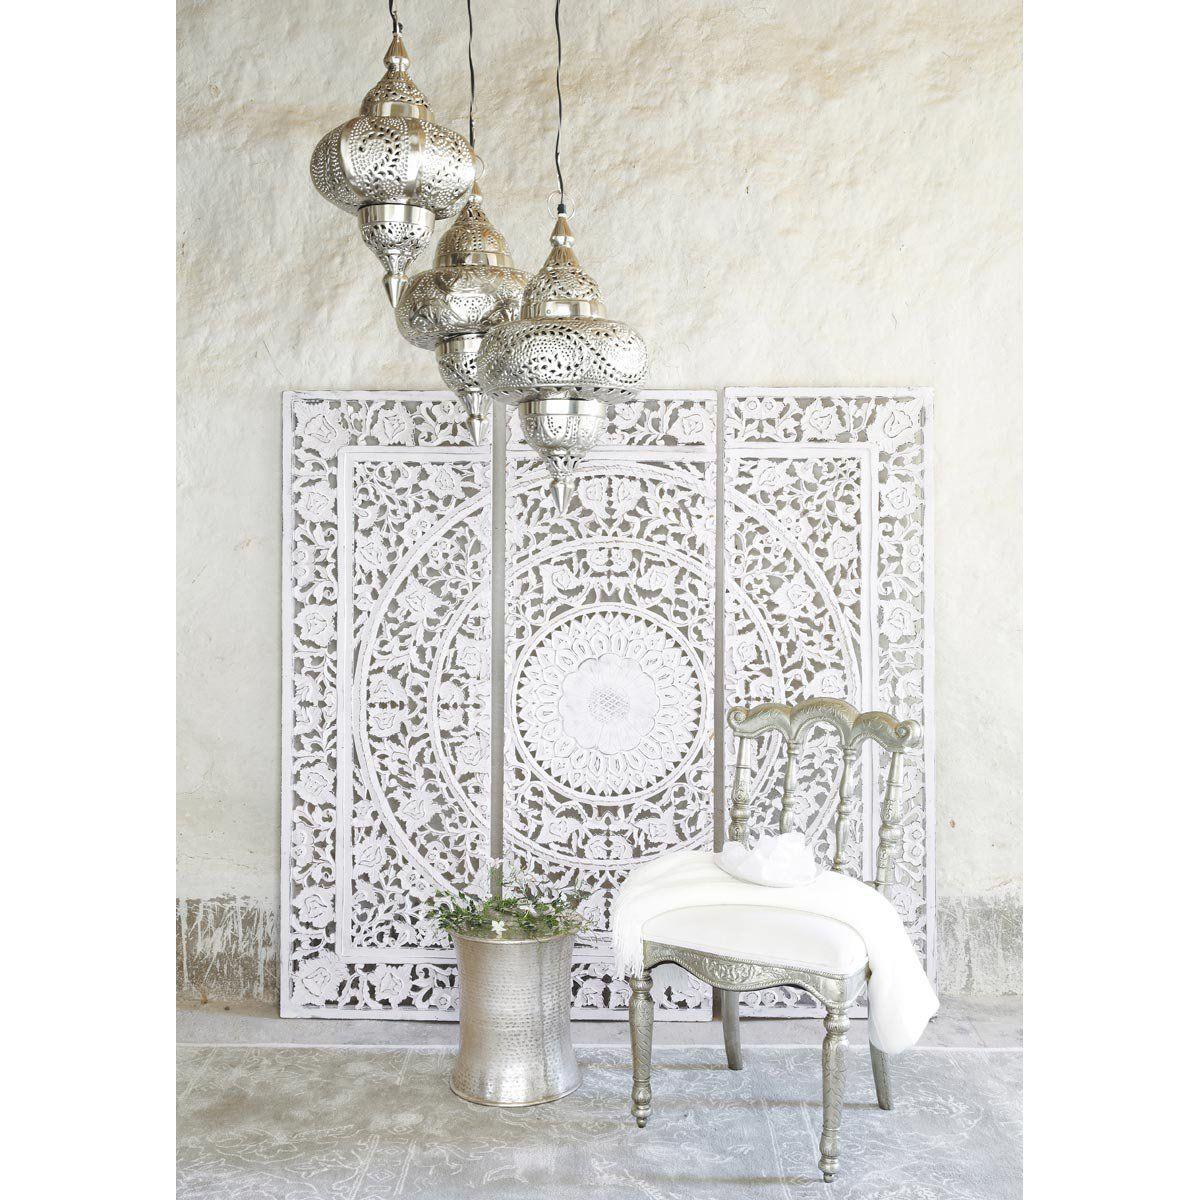 suspension djerba maisons du monde exotic pinterest. Black Bedroom Furniture Sets. Home Design Ideas